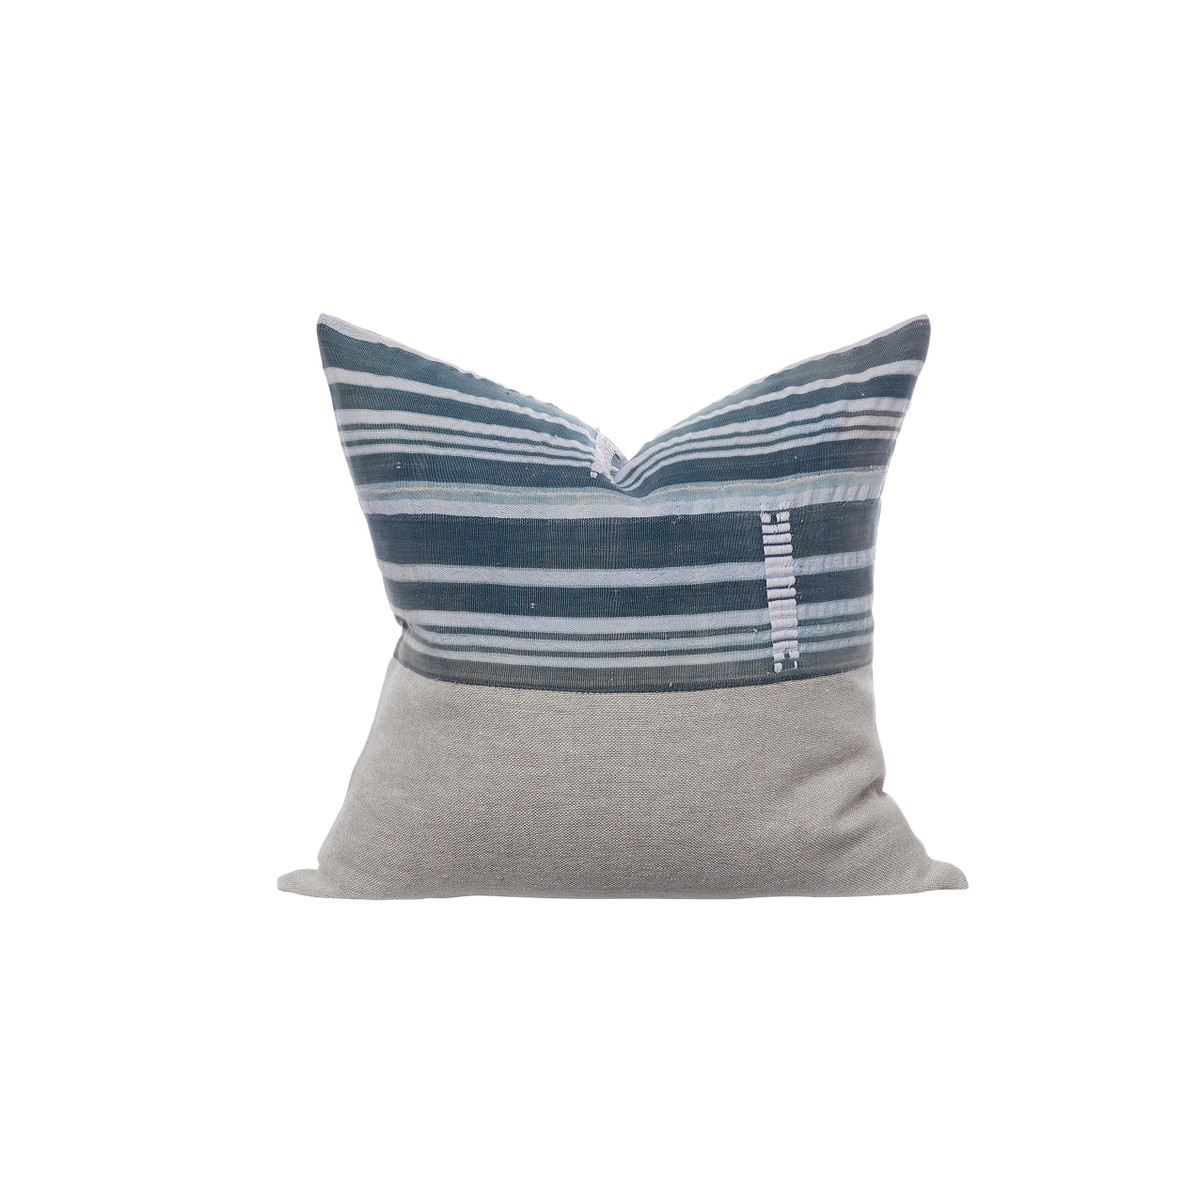 Vintage African Indigo Pillow  - Indigo Sea Pillow 22 - Front View